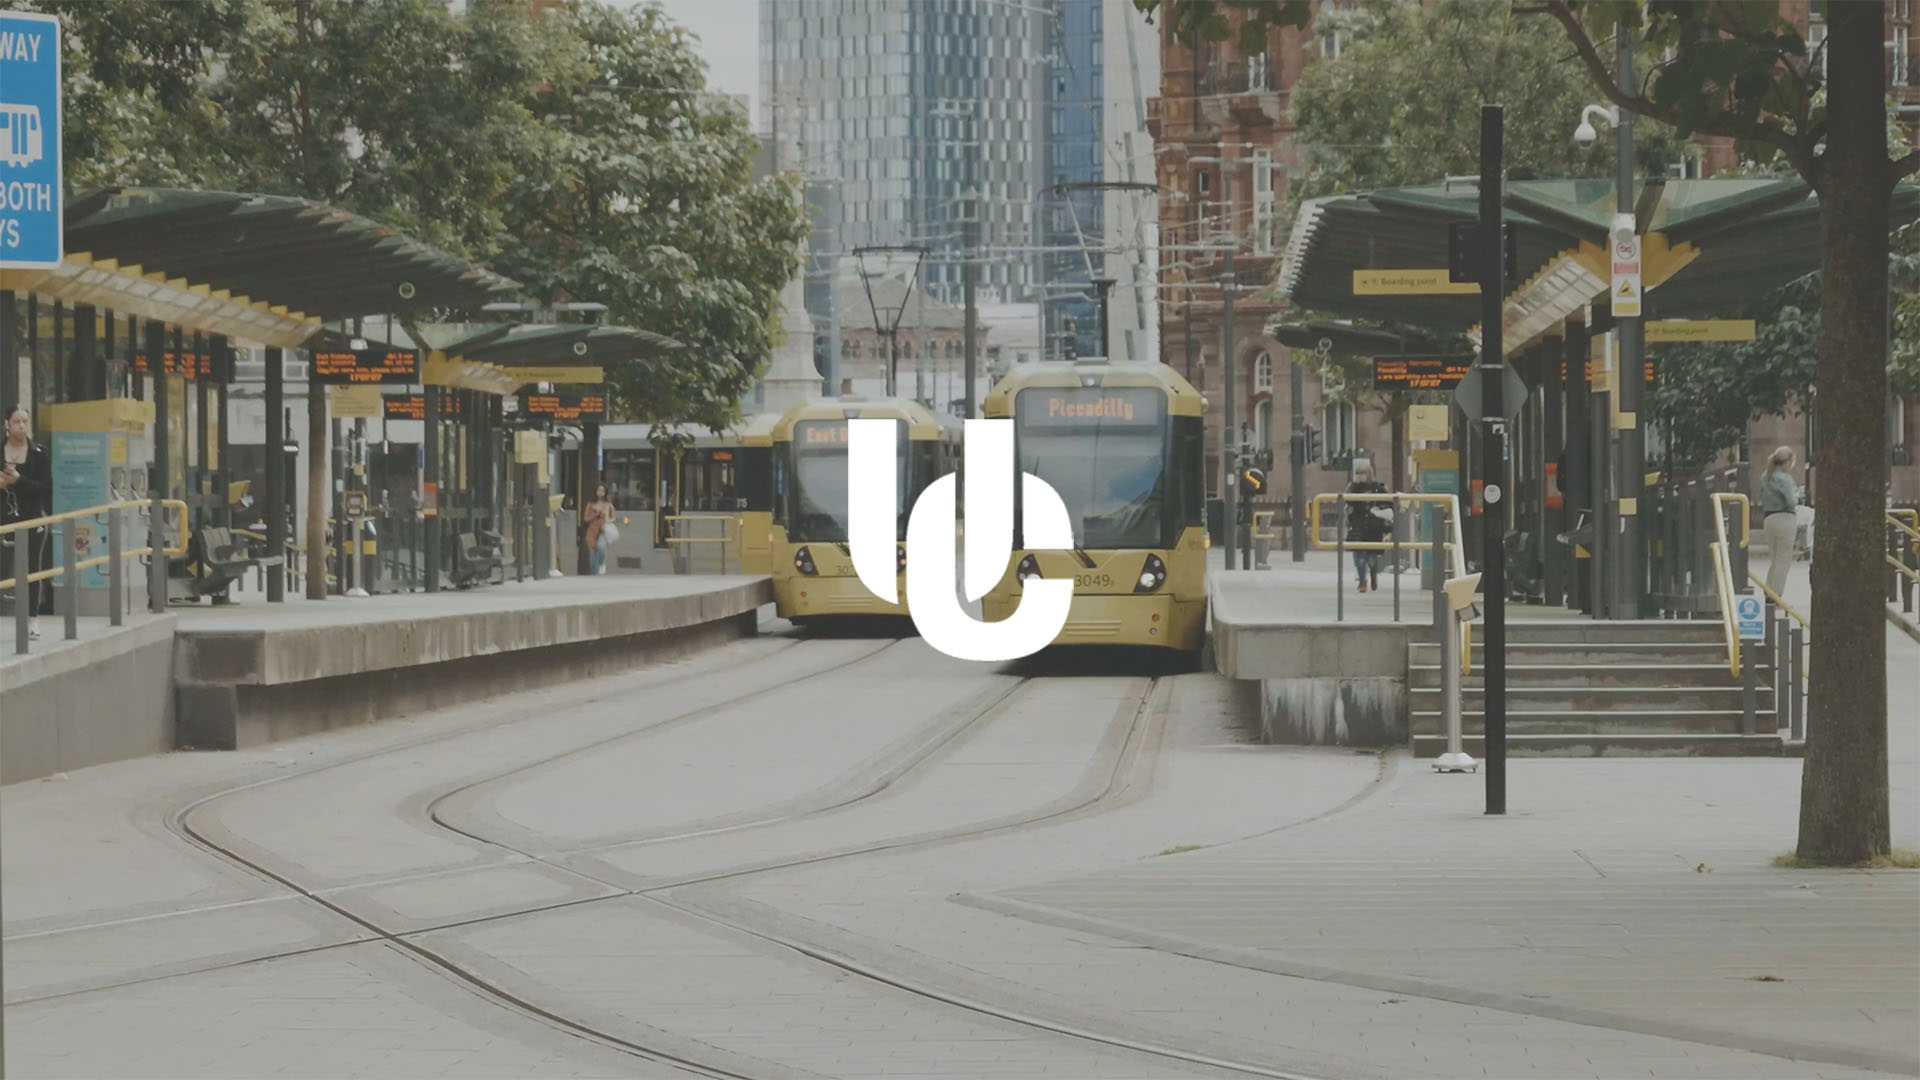 UnitedCity express frustration at postponement of lockdown easing